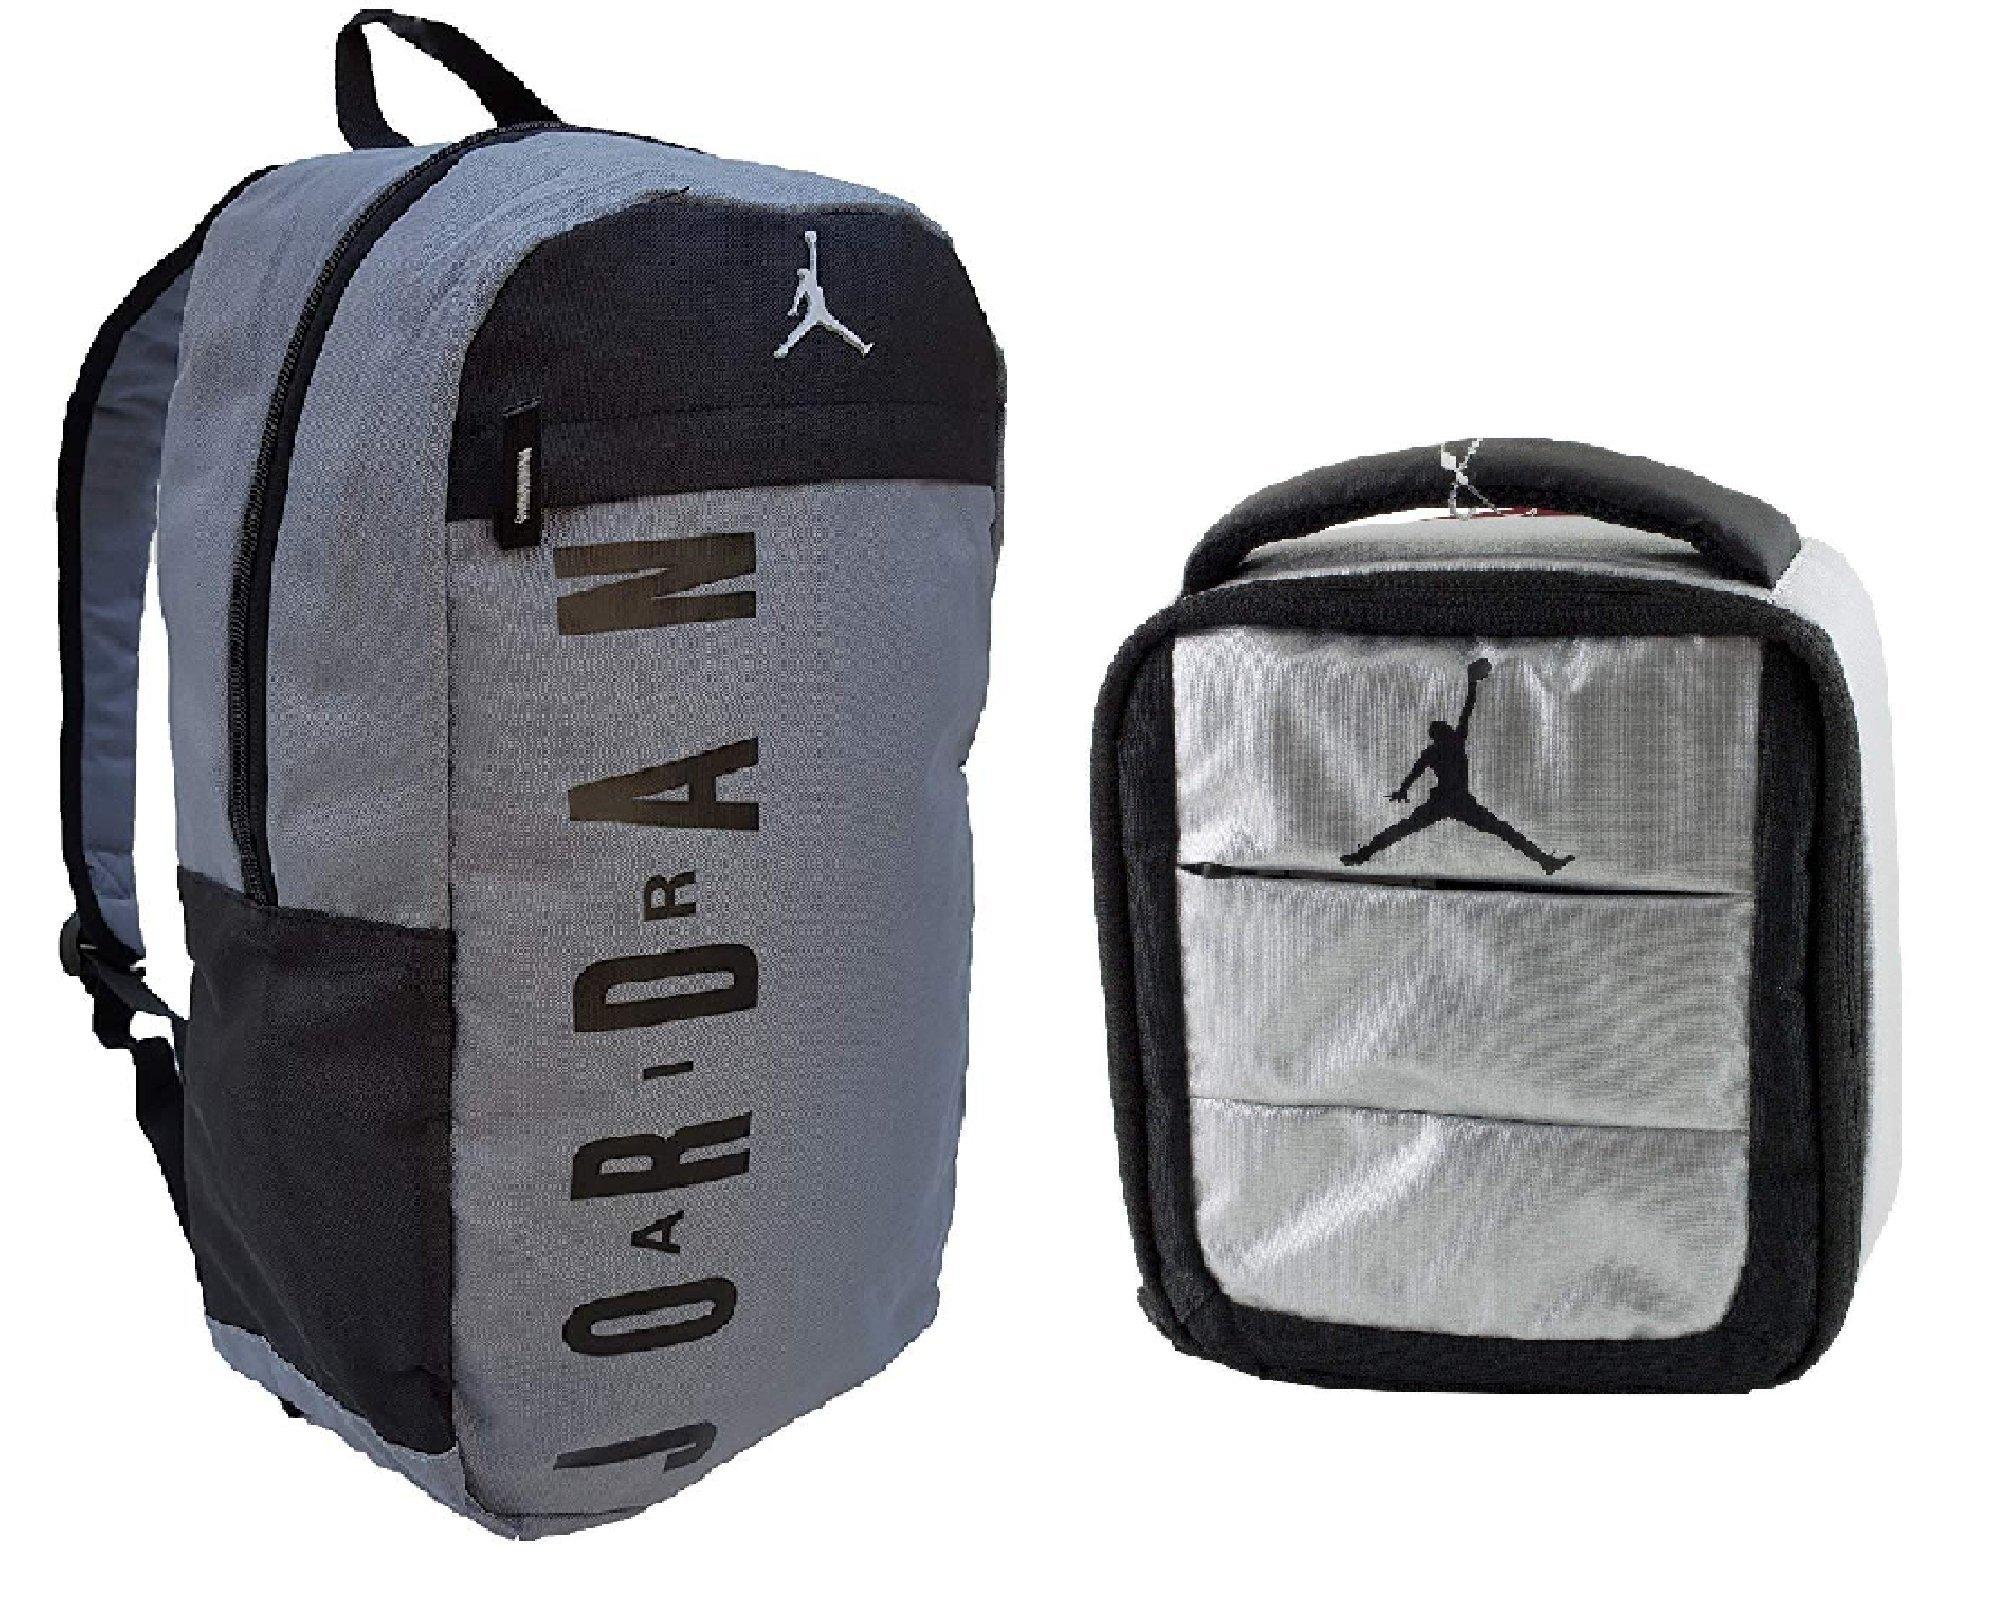 NIKE Air Jordan Jumpman Kids Backpack & Insulated Lunch Tote Set Cool Grey/Siver